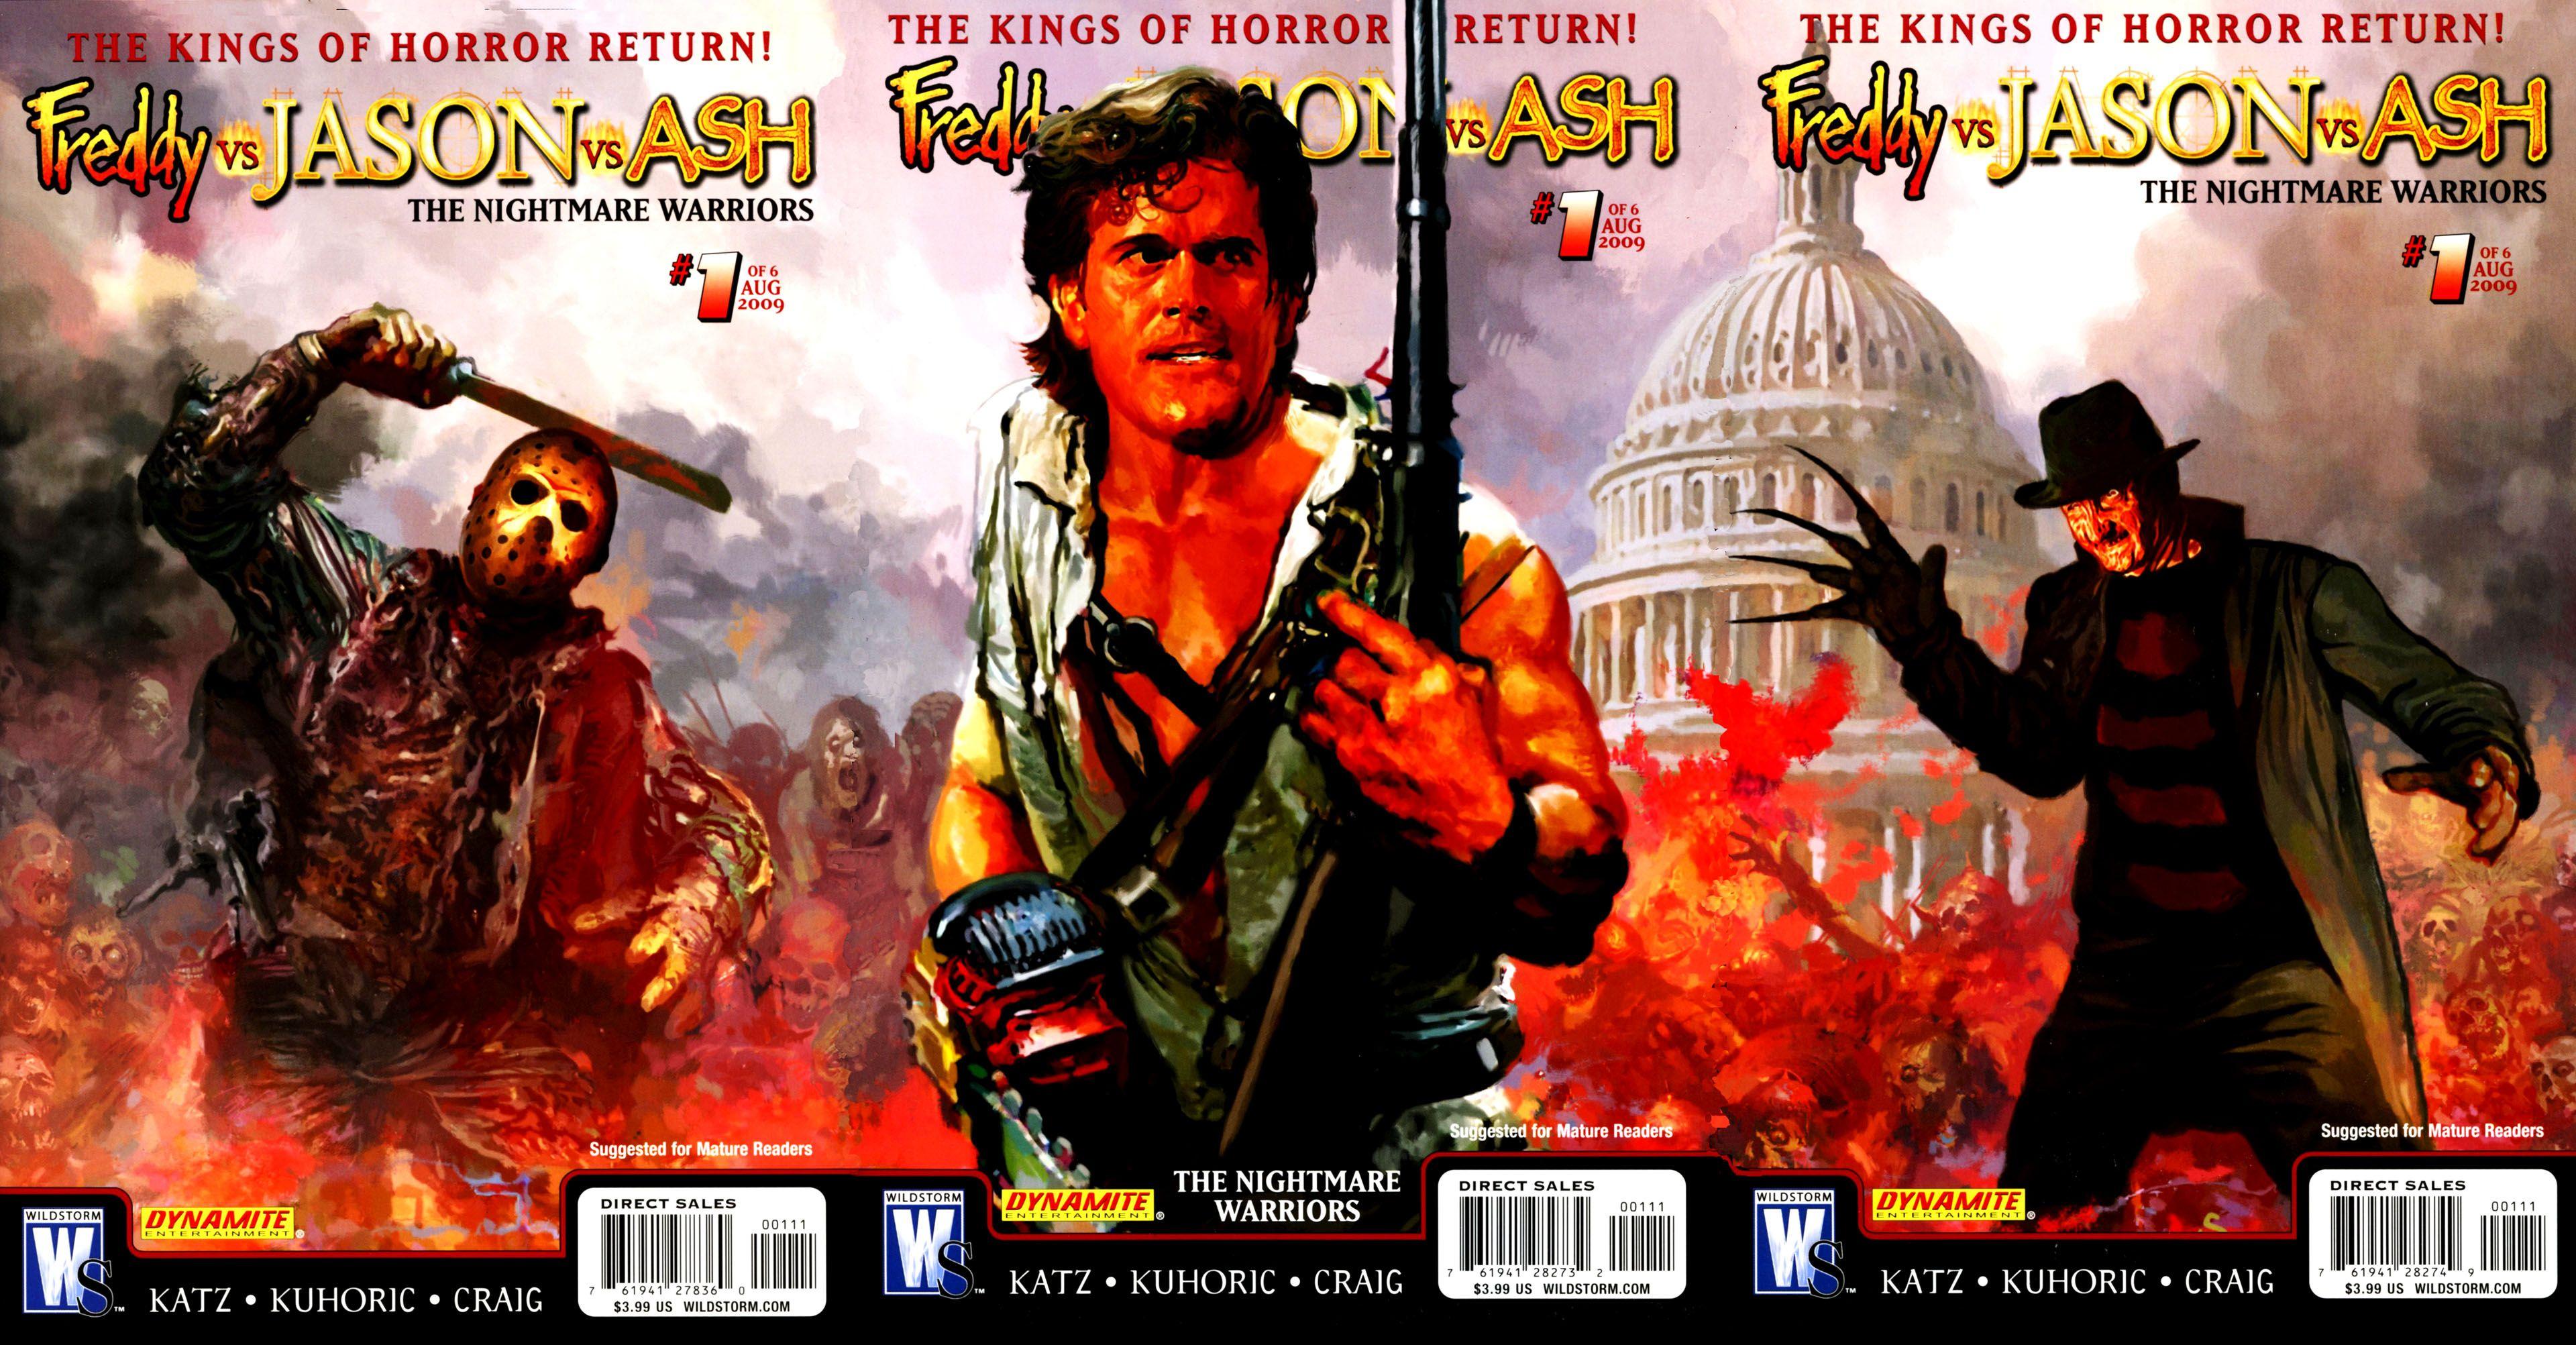 Freddy Vs Jason Ash Nightmare Warriors